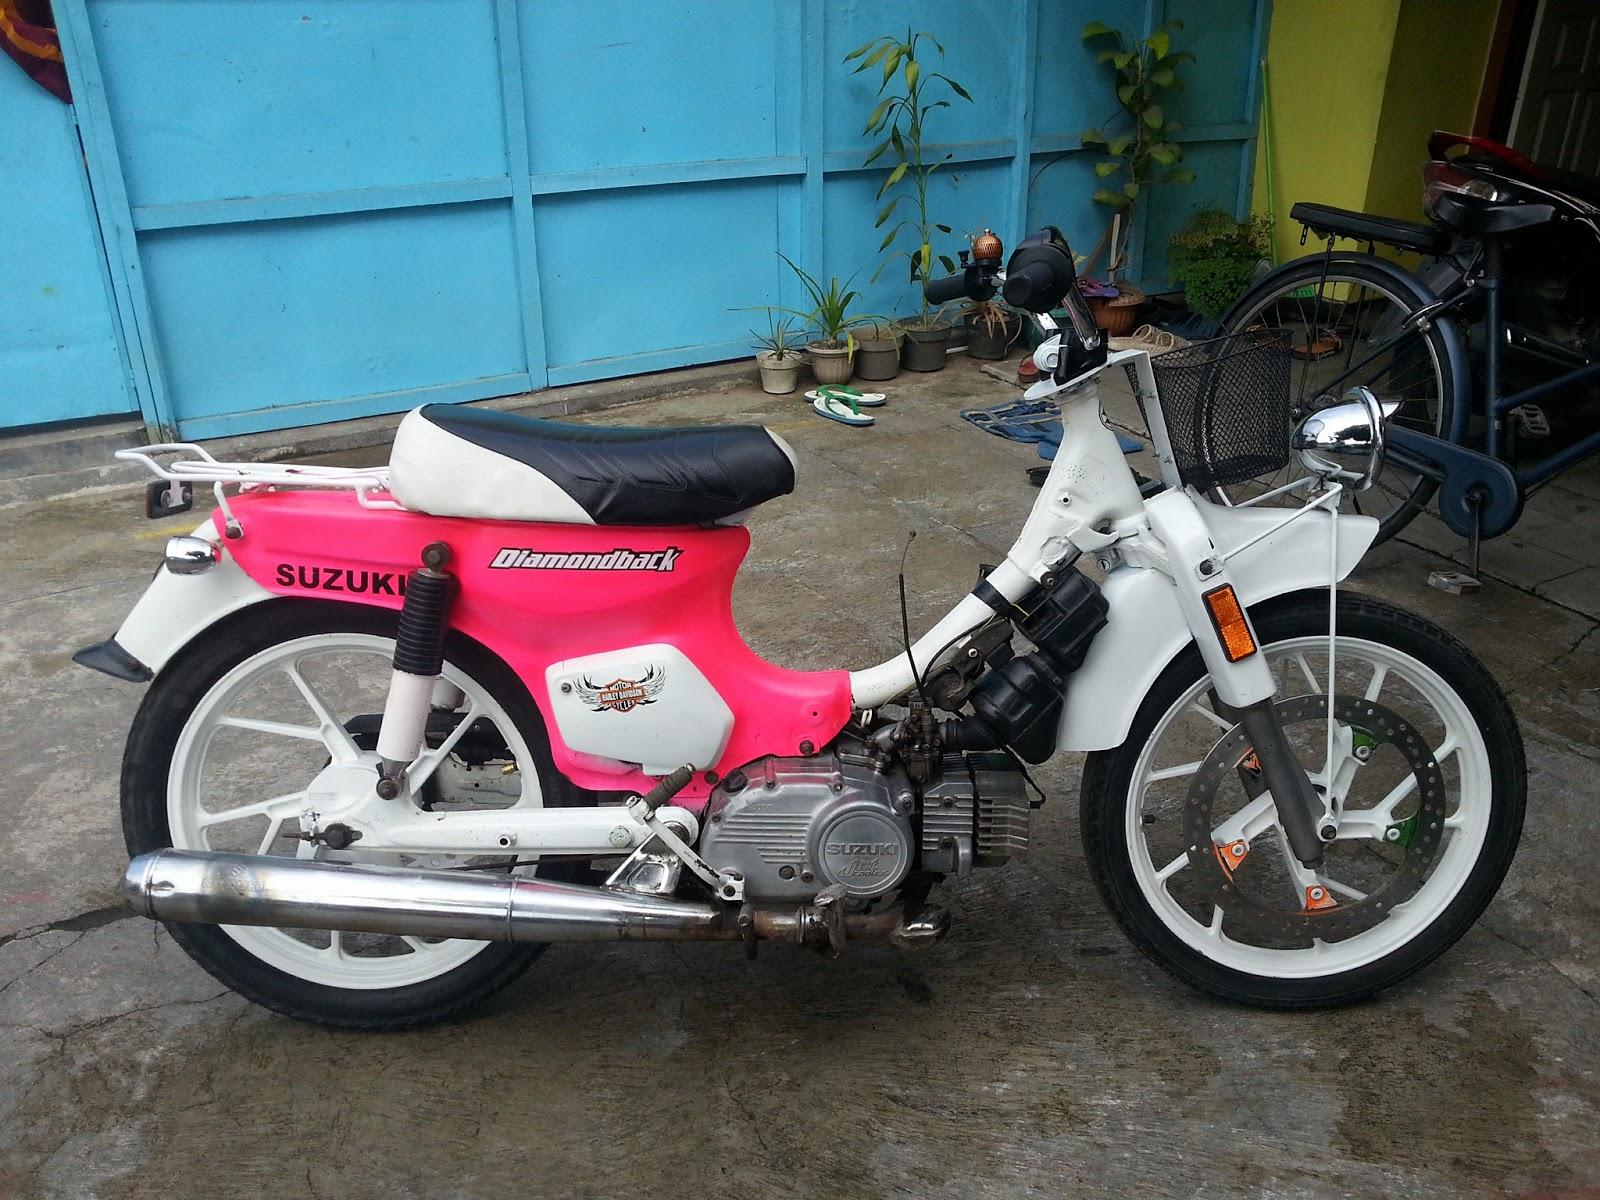 Gambar Modifikasi Motor Suzuki Rc 100 Wacana Modif Motor